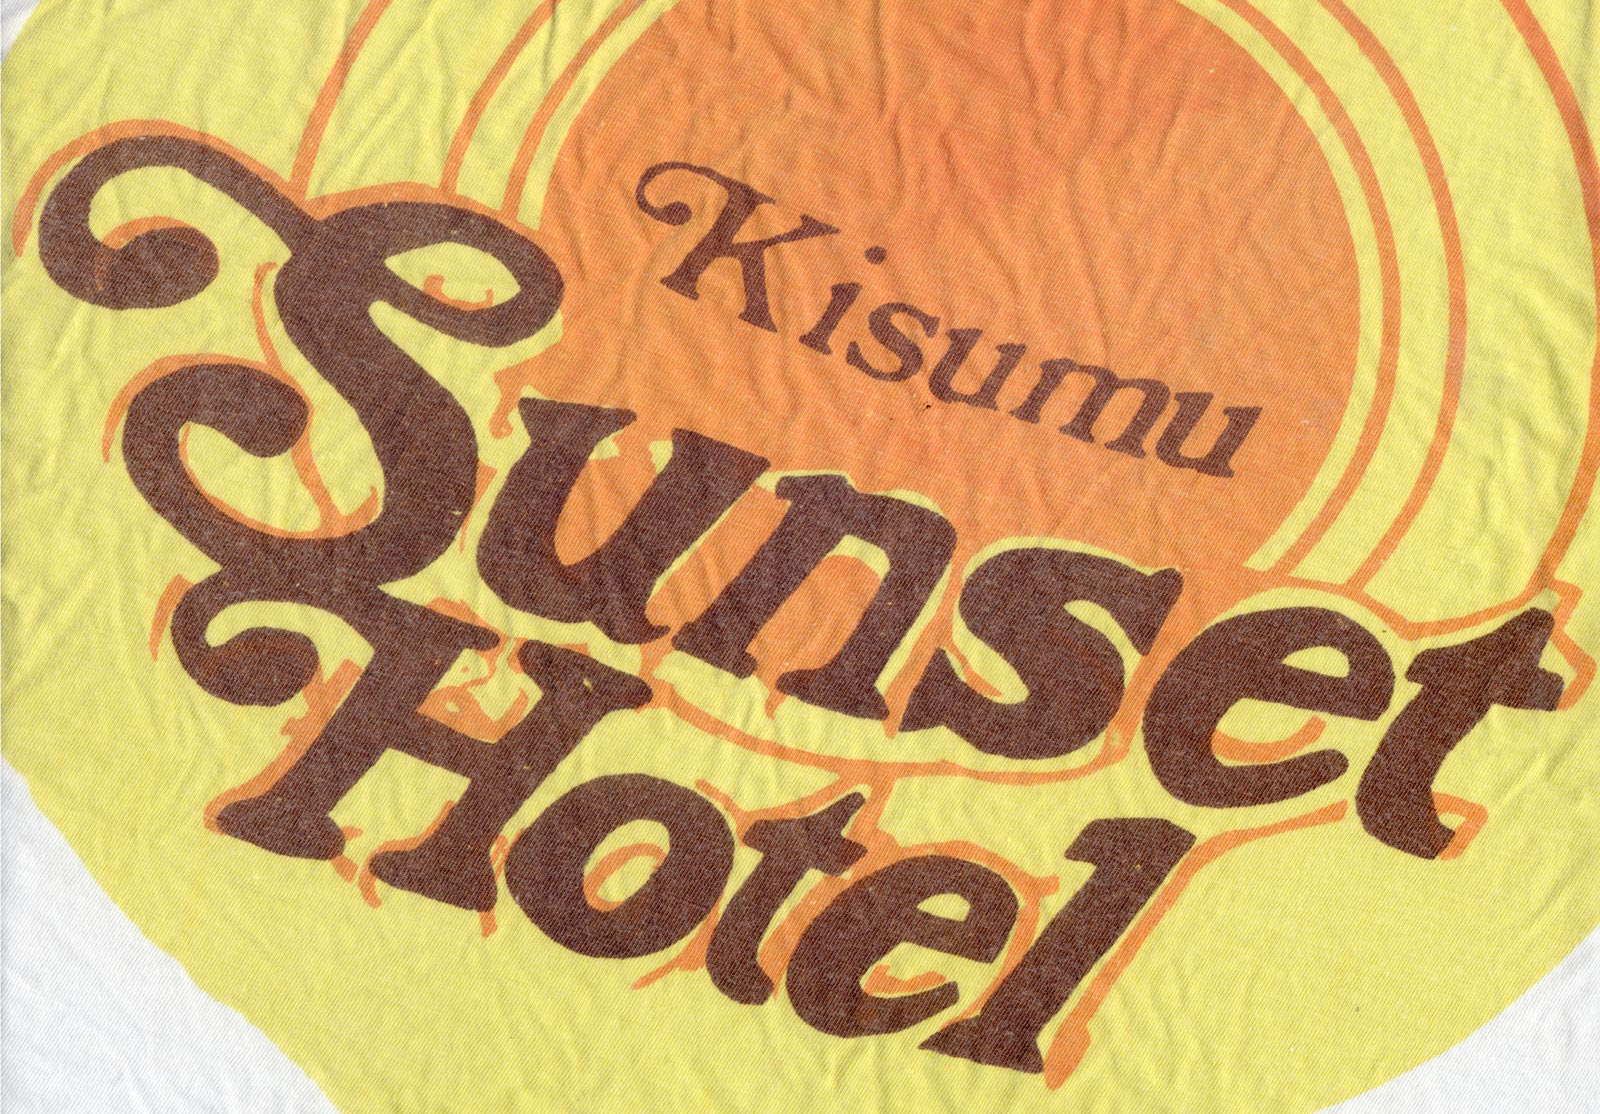 Kisumu Sunset Hotel